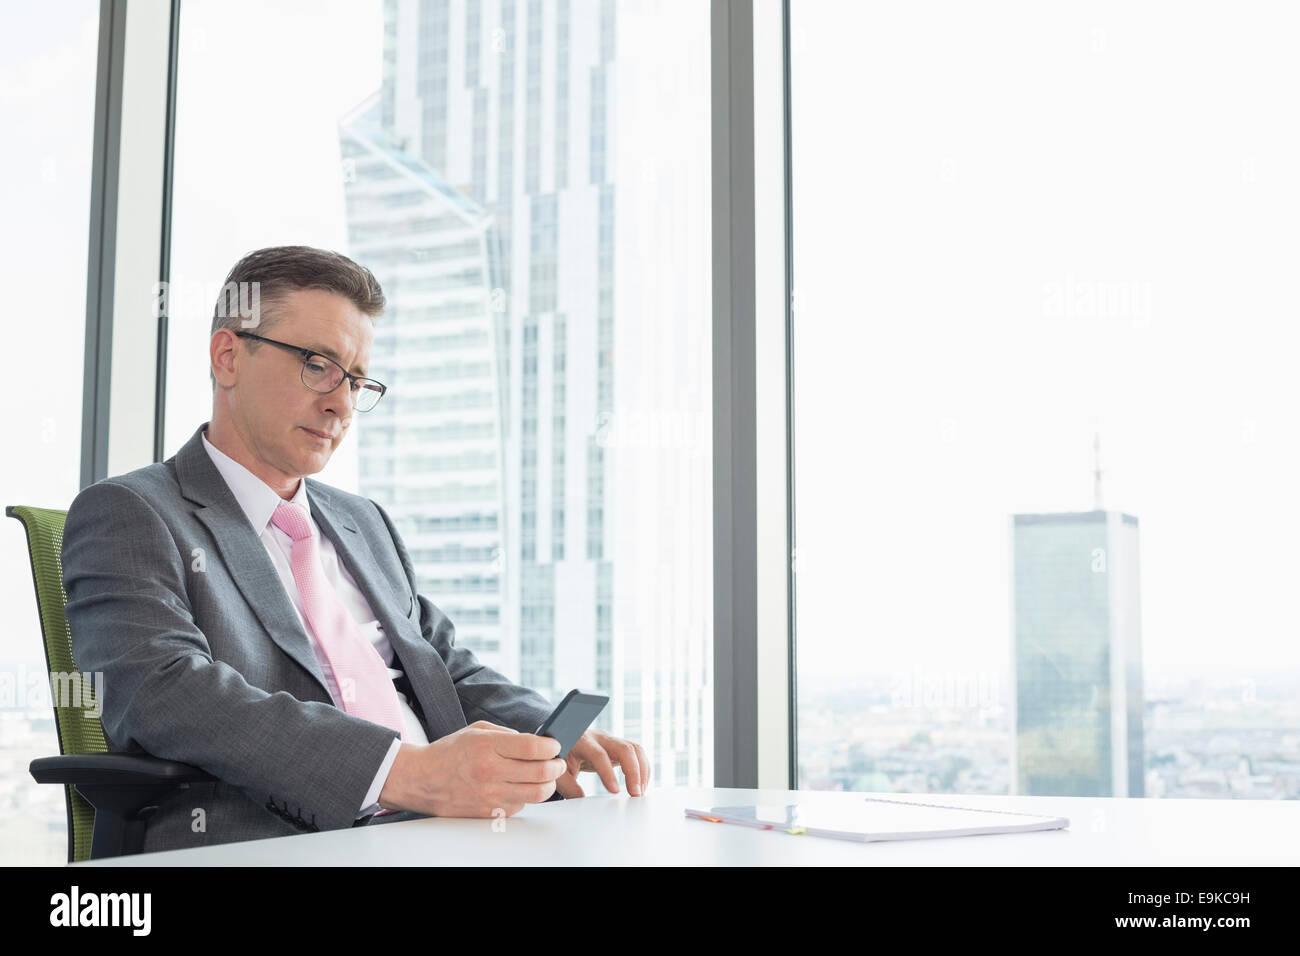 Mature businessman text messaging through cell phone near office window - Stock Image